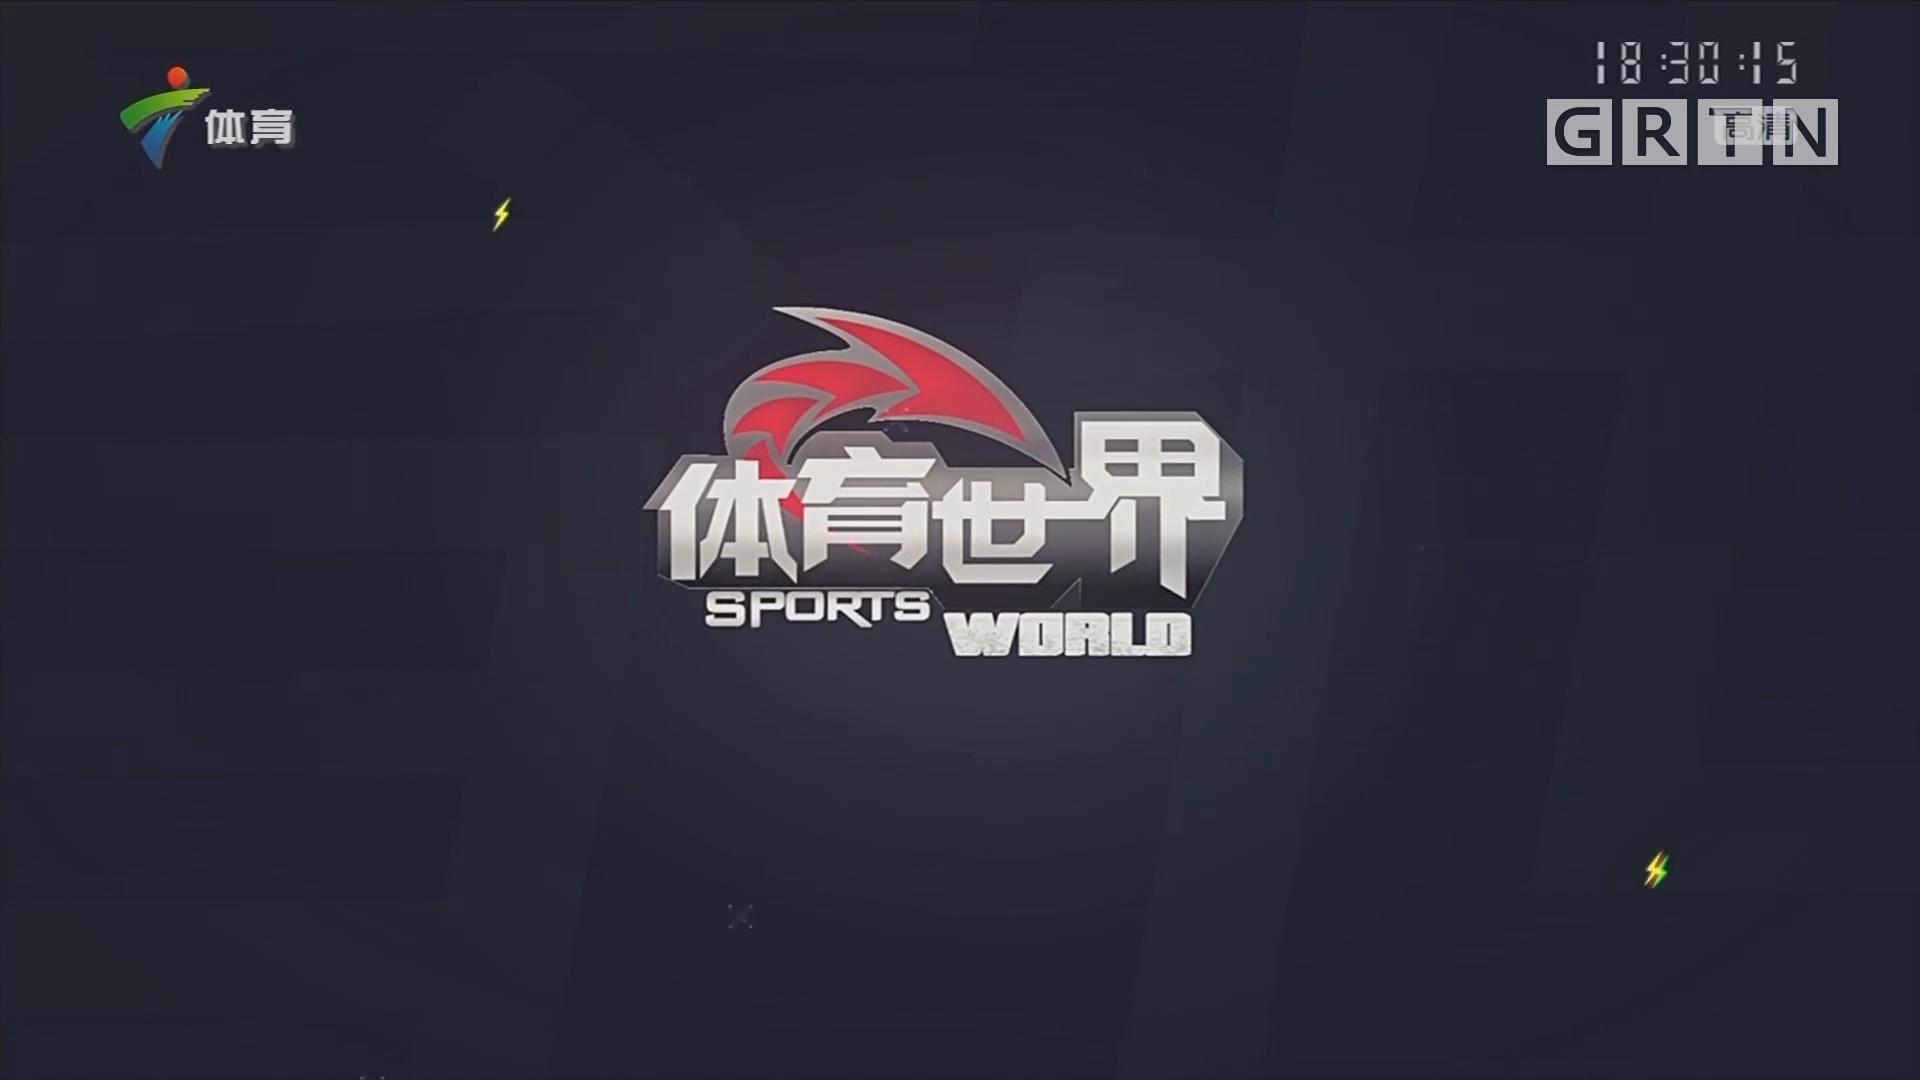 [HD][2018-11-06]体育世界:南粤古驿道平远站 足球名宿传递快乐足球